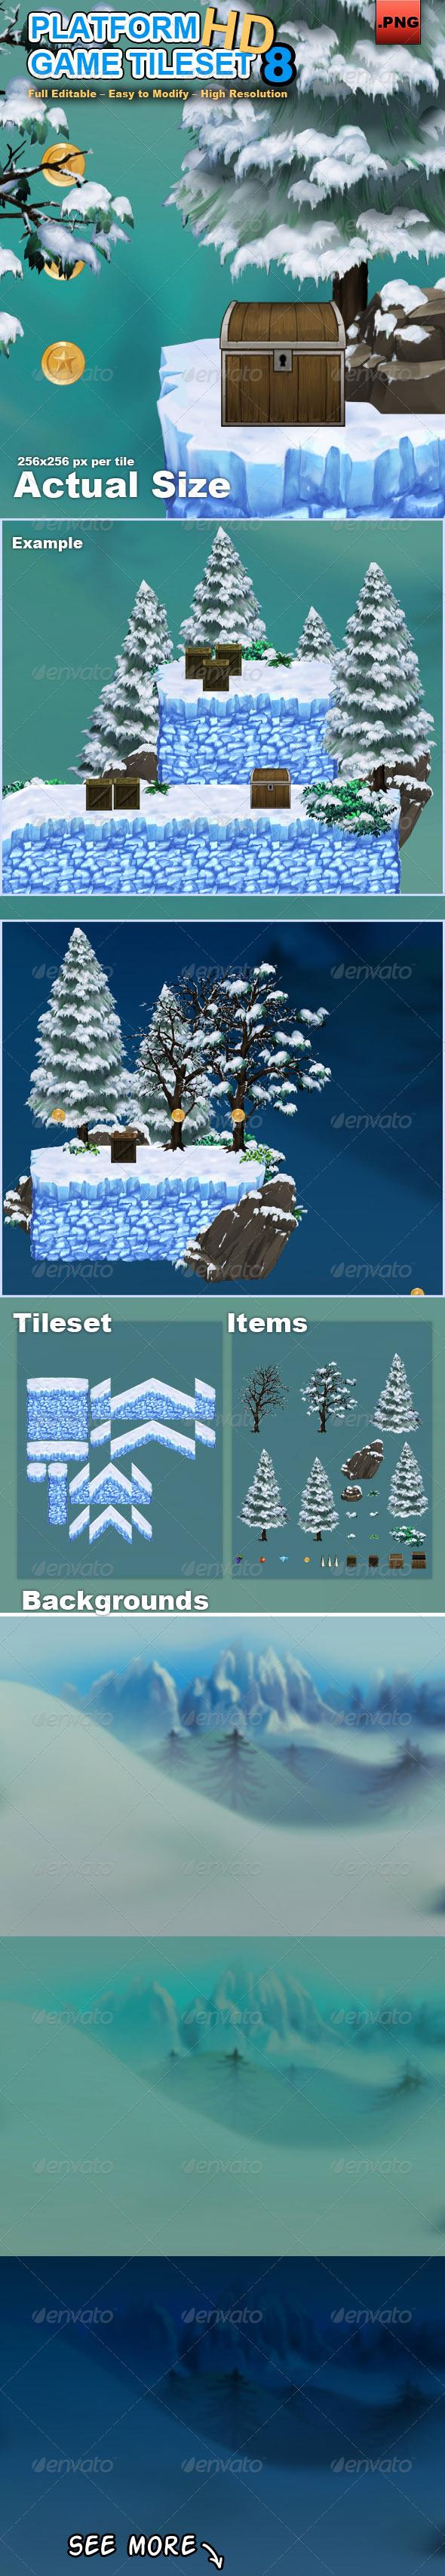 GraphicRiver Platform Game Tileset 8 HD 7758026